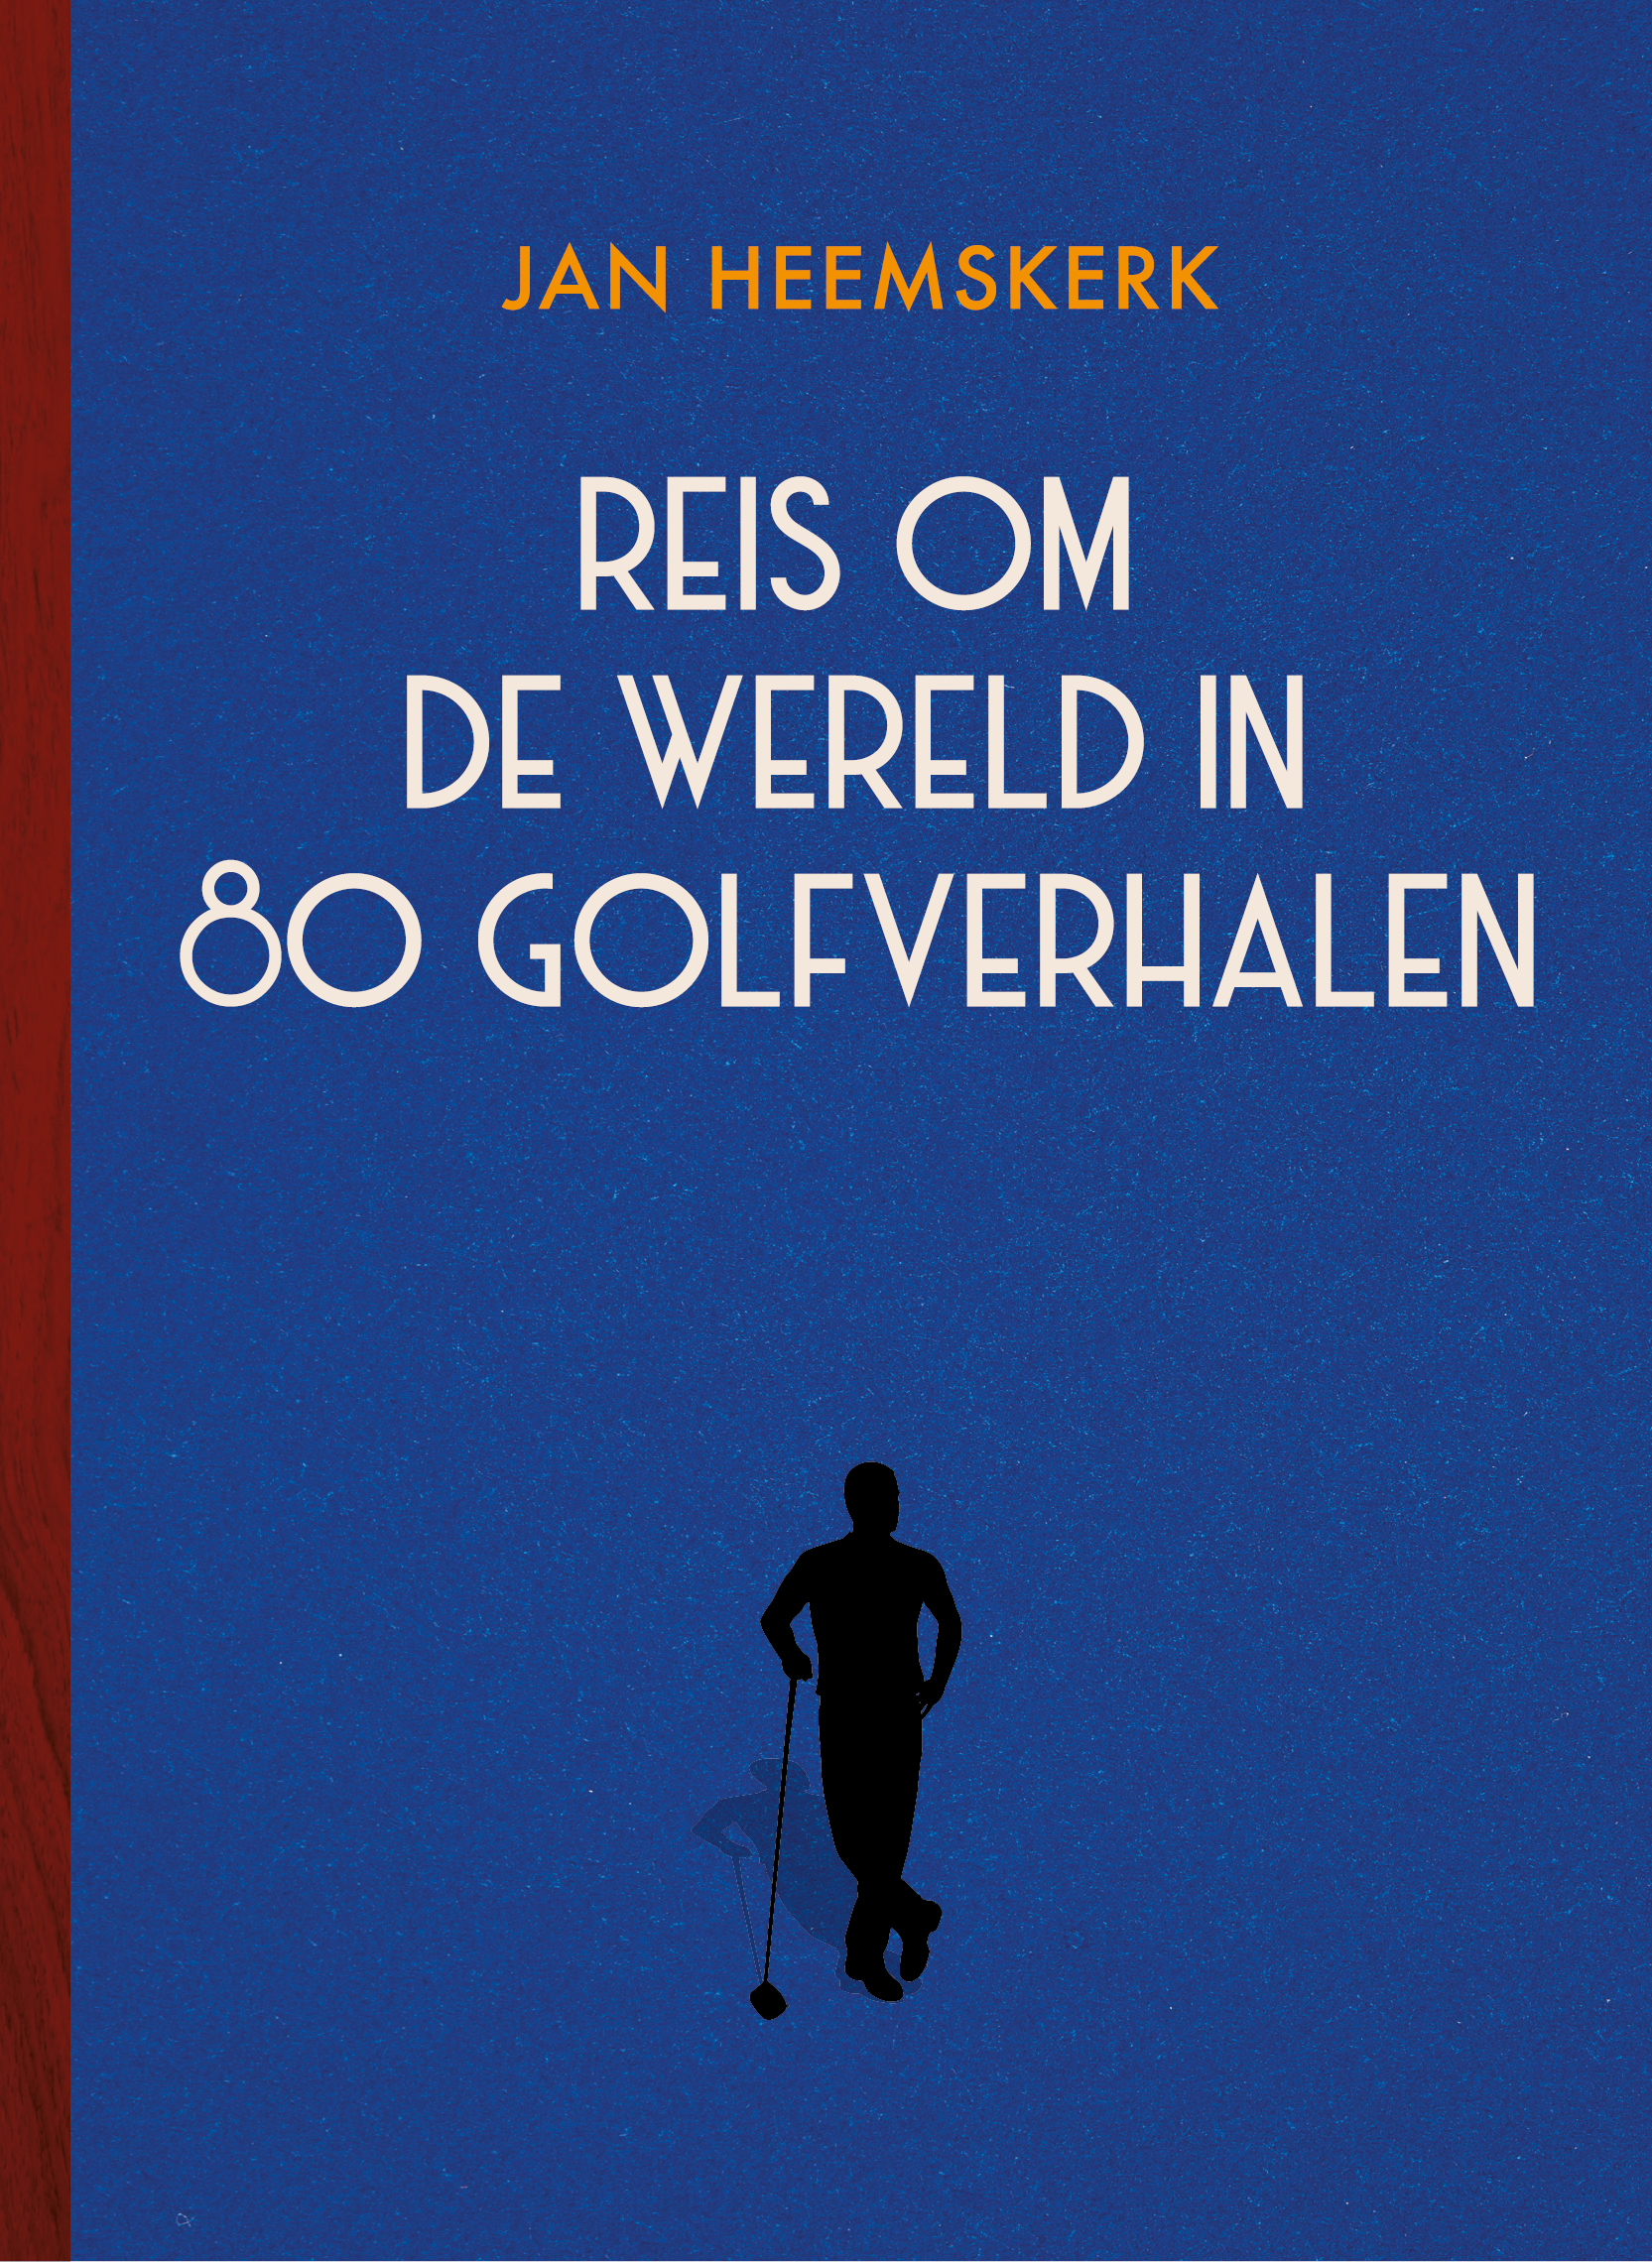 REIS OM DE WERELD IN 80 GOLFREIZENJAN HEEMSKERK